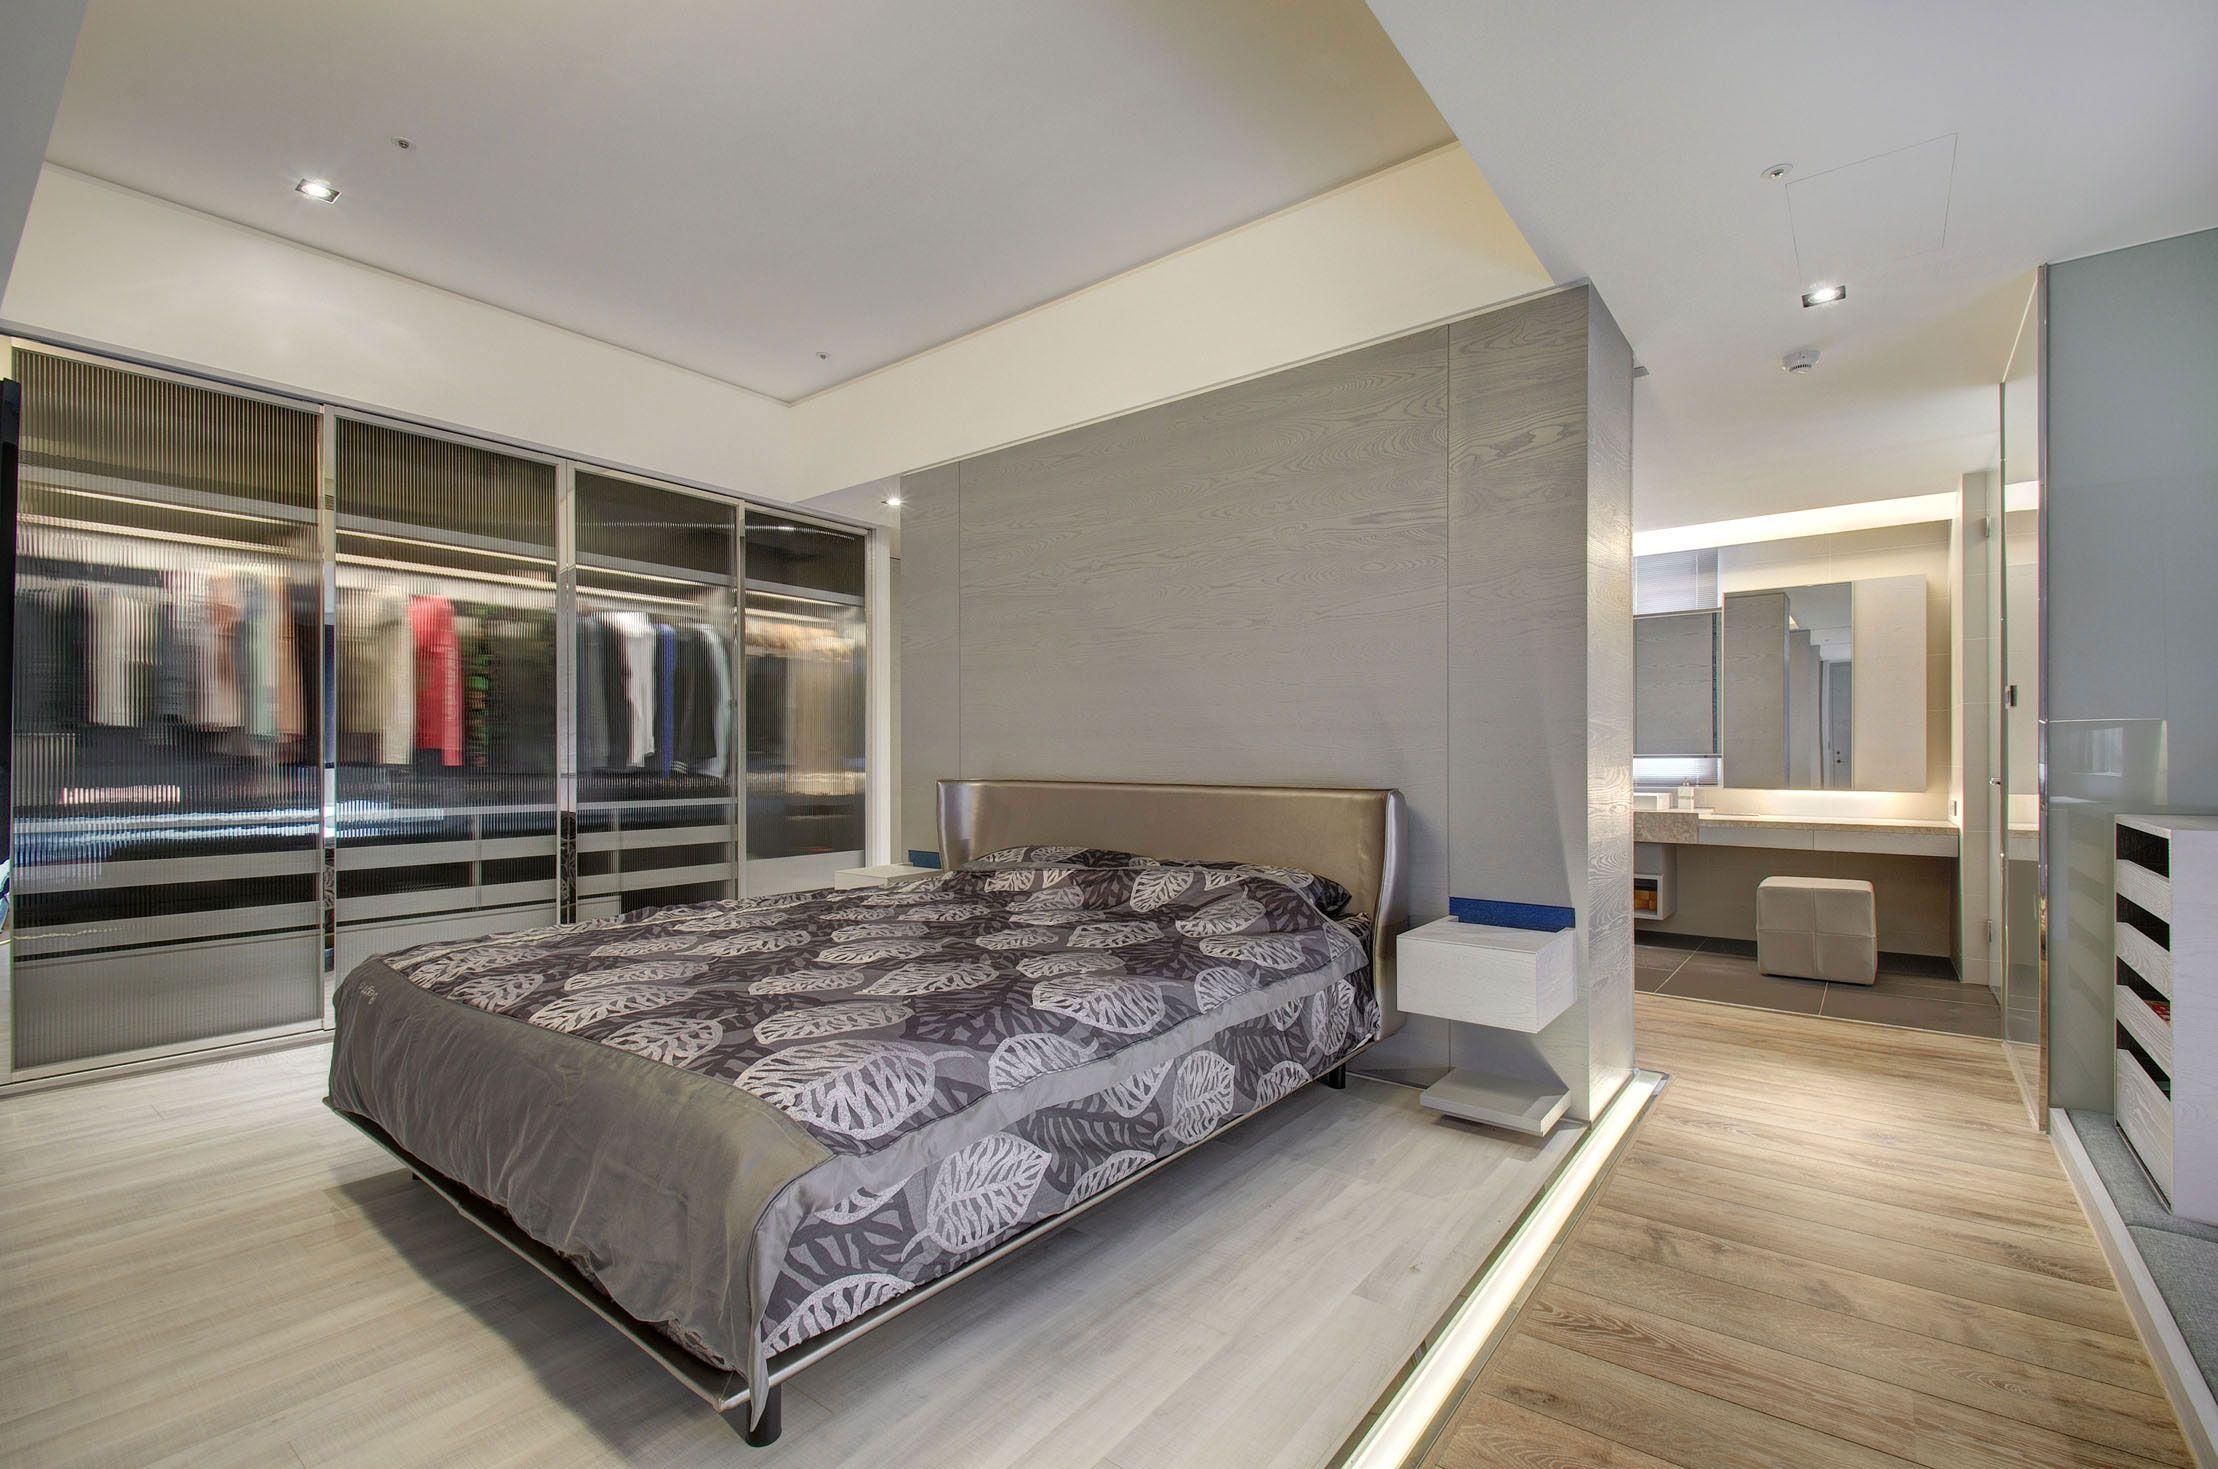 Bedroom interior design in modern style